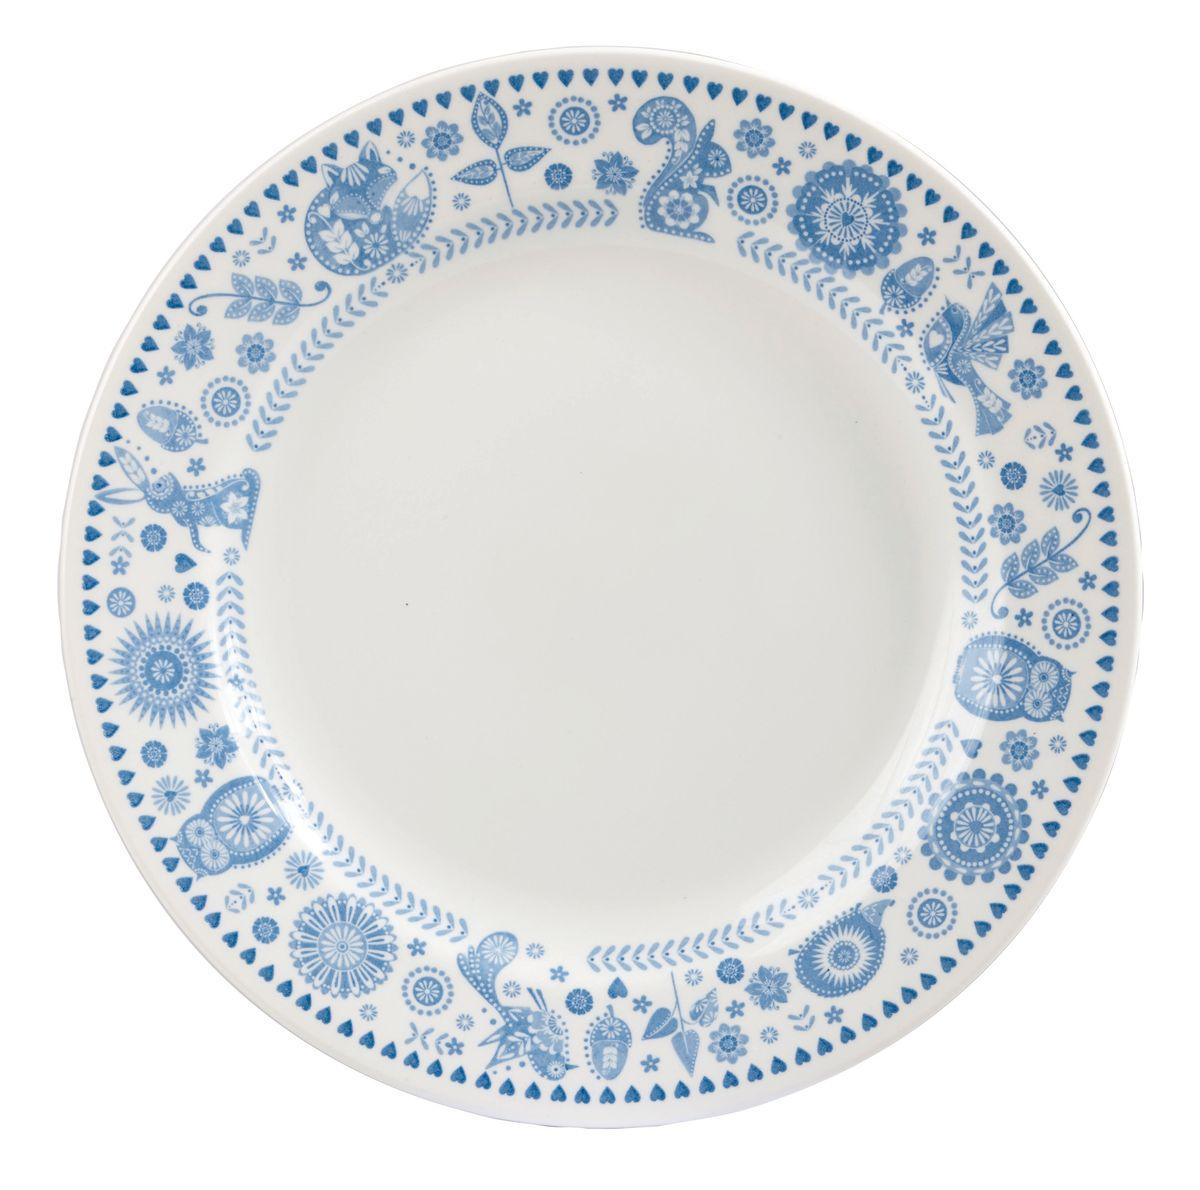 Тарелка обеденная Churchill Пензанс, диаметр 26 см тарелка churchill инки диаметр 26 см